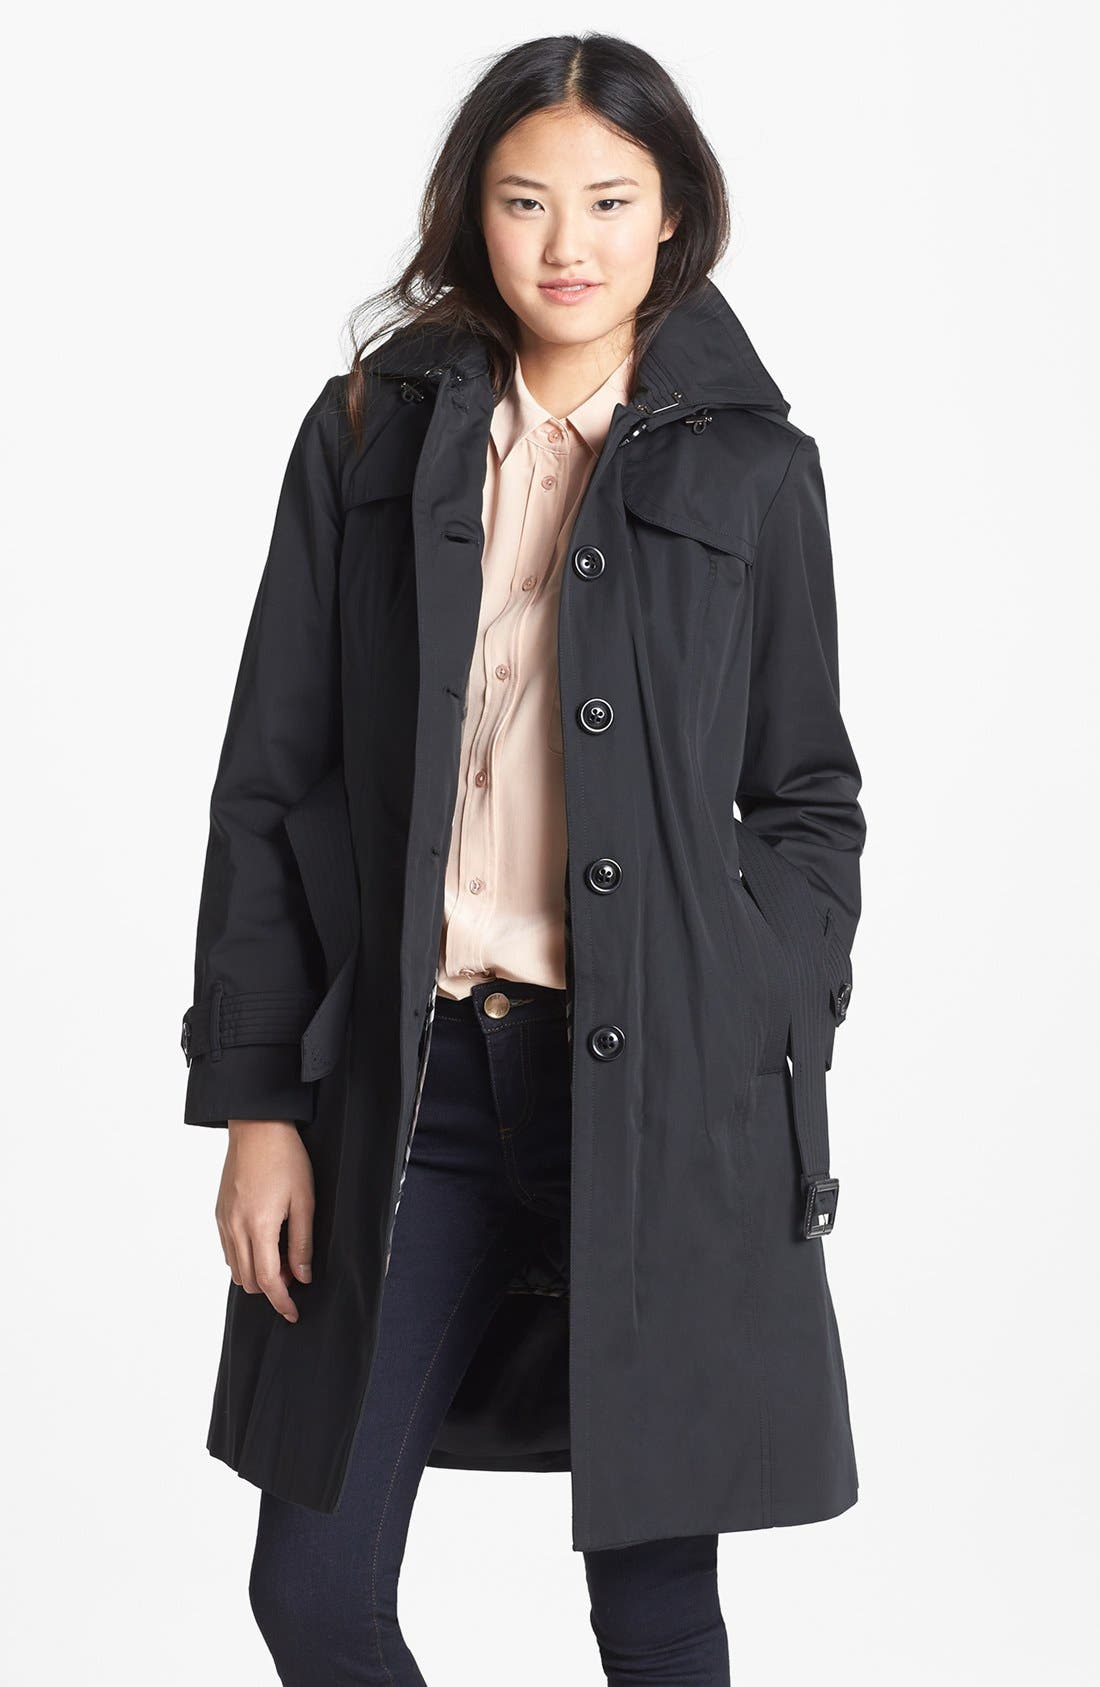 Main Image - London Fog Trench Coat with Detachable Hood & Liner (Regular) (Online Only)